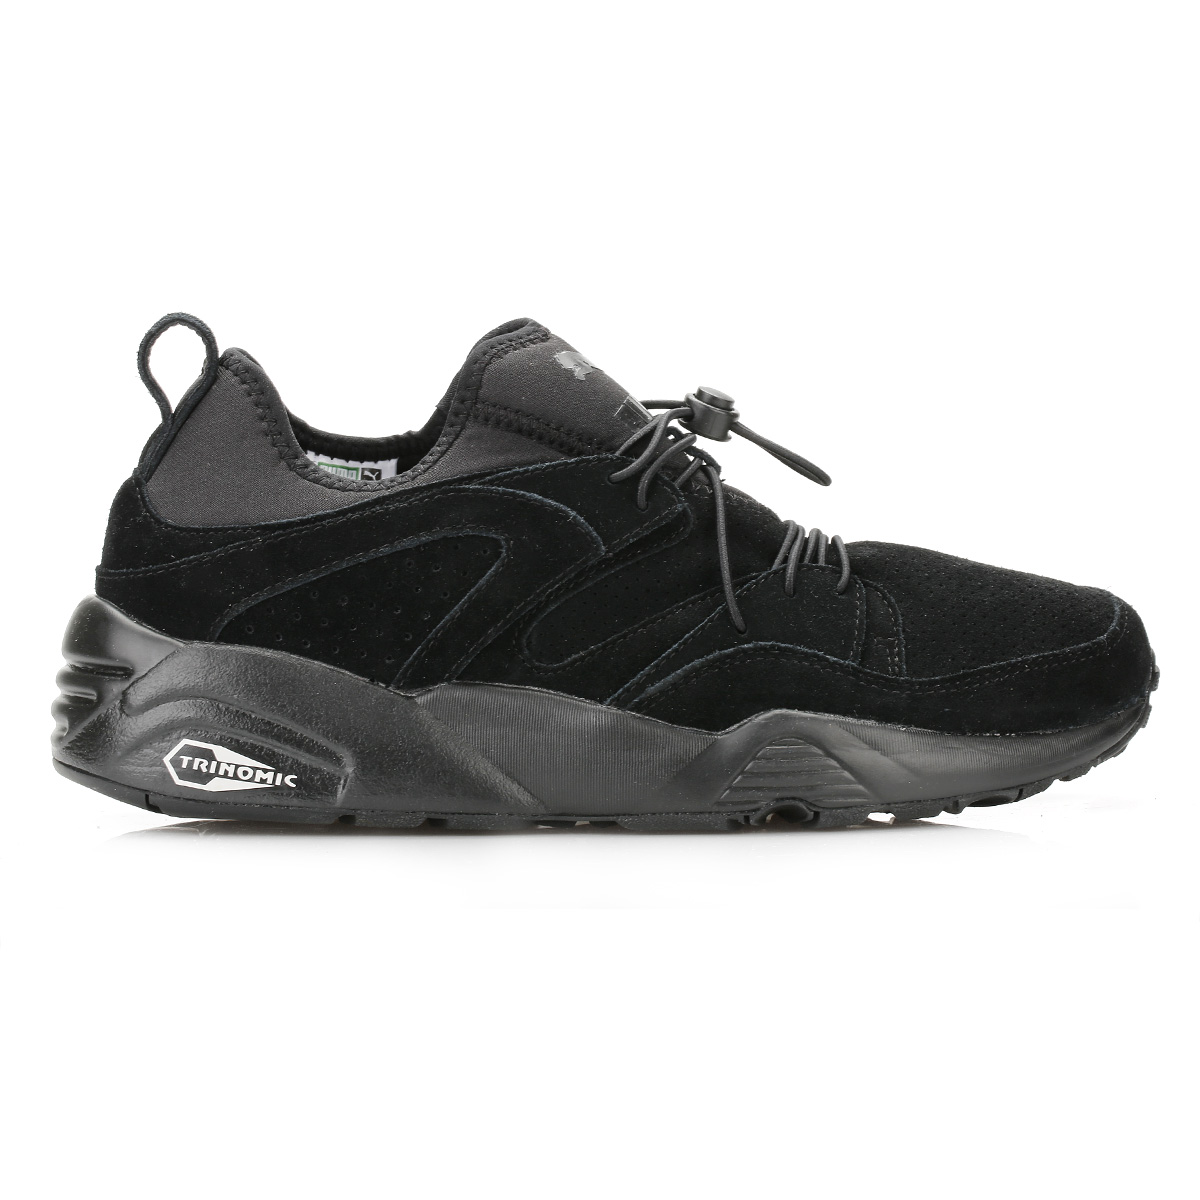 835599d9533 Puma-Mens-Blaze-Of-Glory-Soft-Trainers-Black-